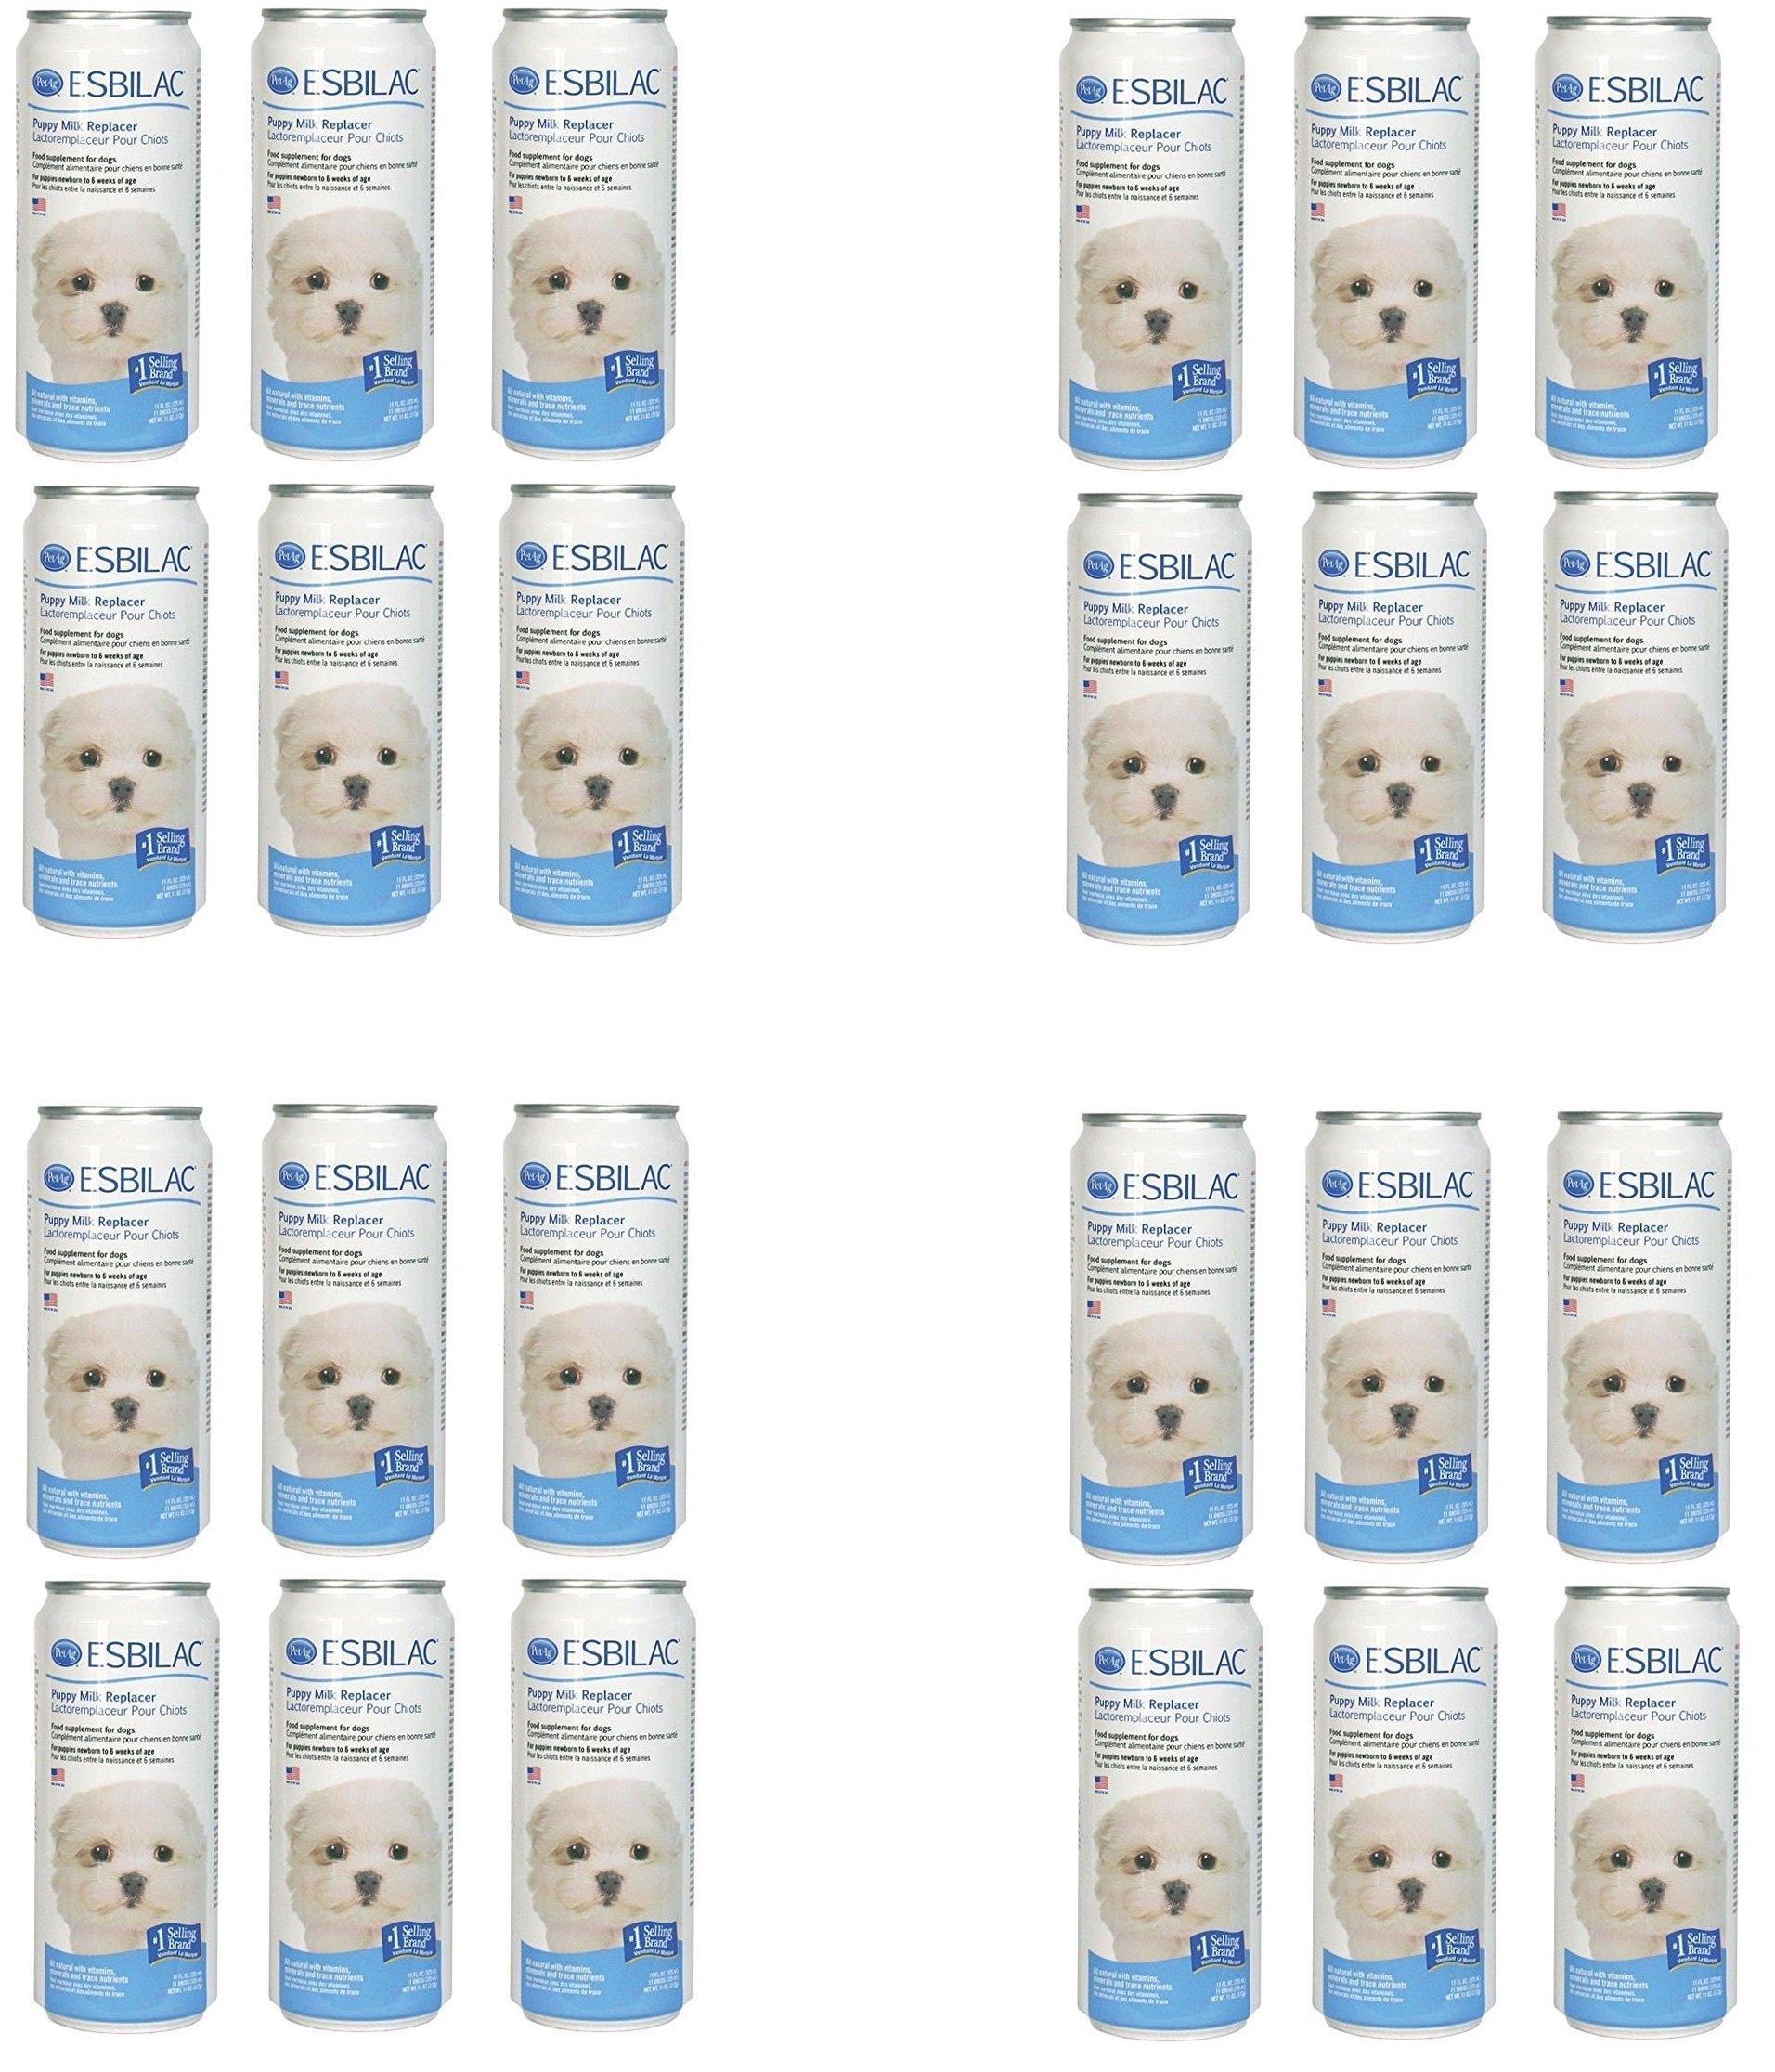 (Case of 24) Esbilac Liquid for Puppies, Milk Replacer - 11 Ounces each by Esbilac